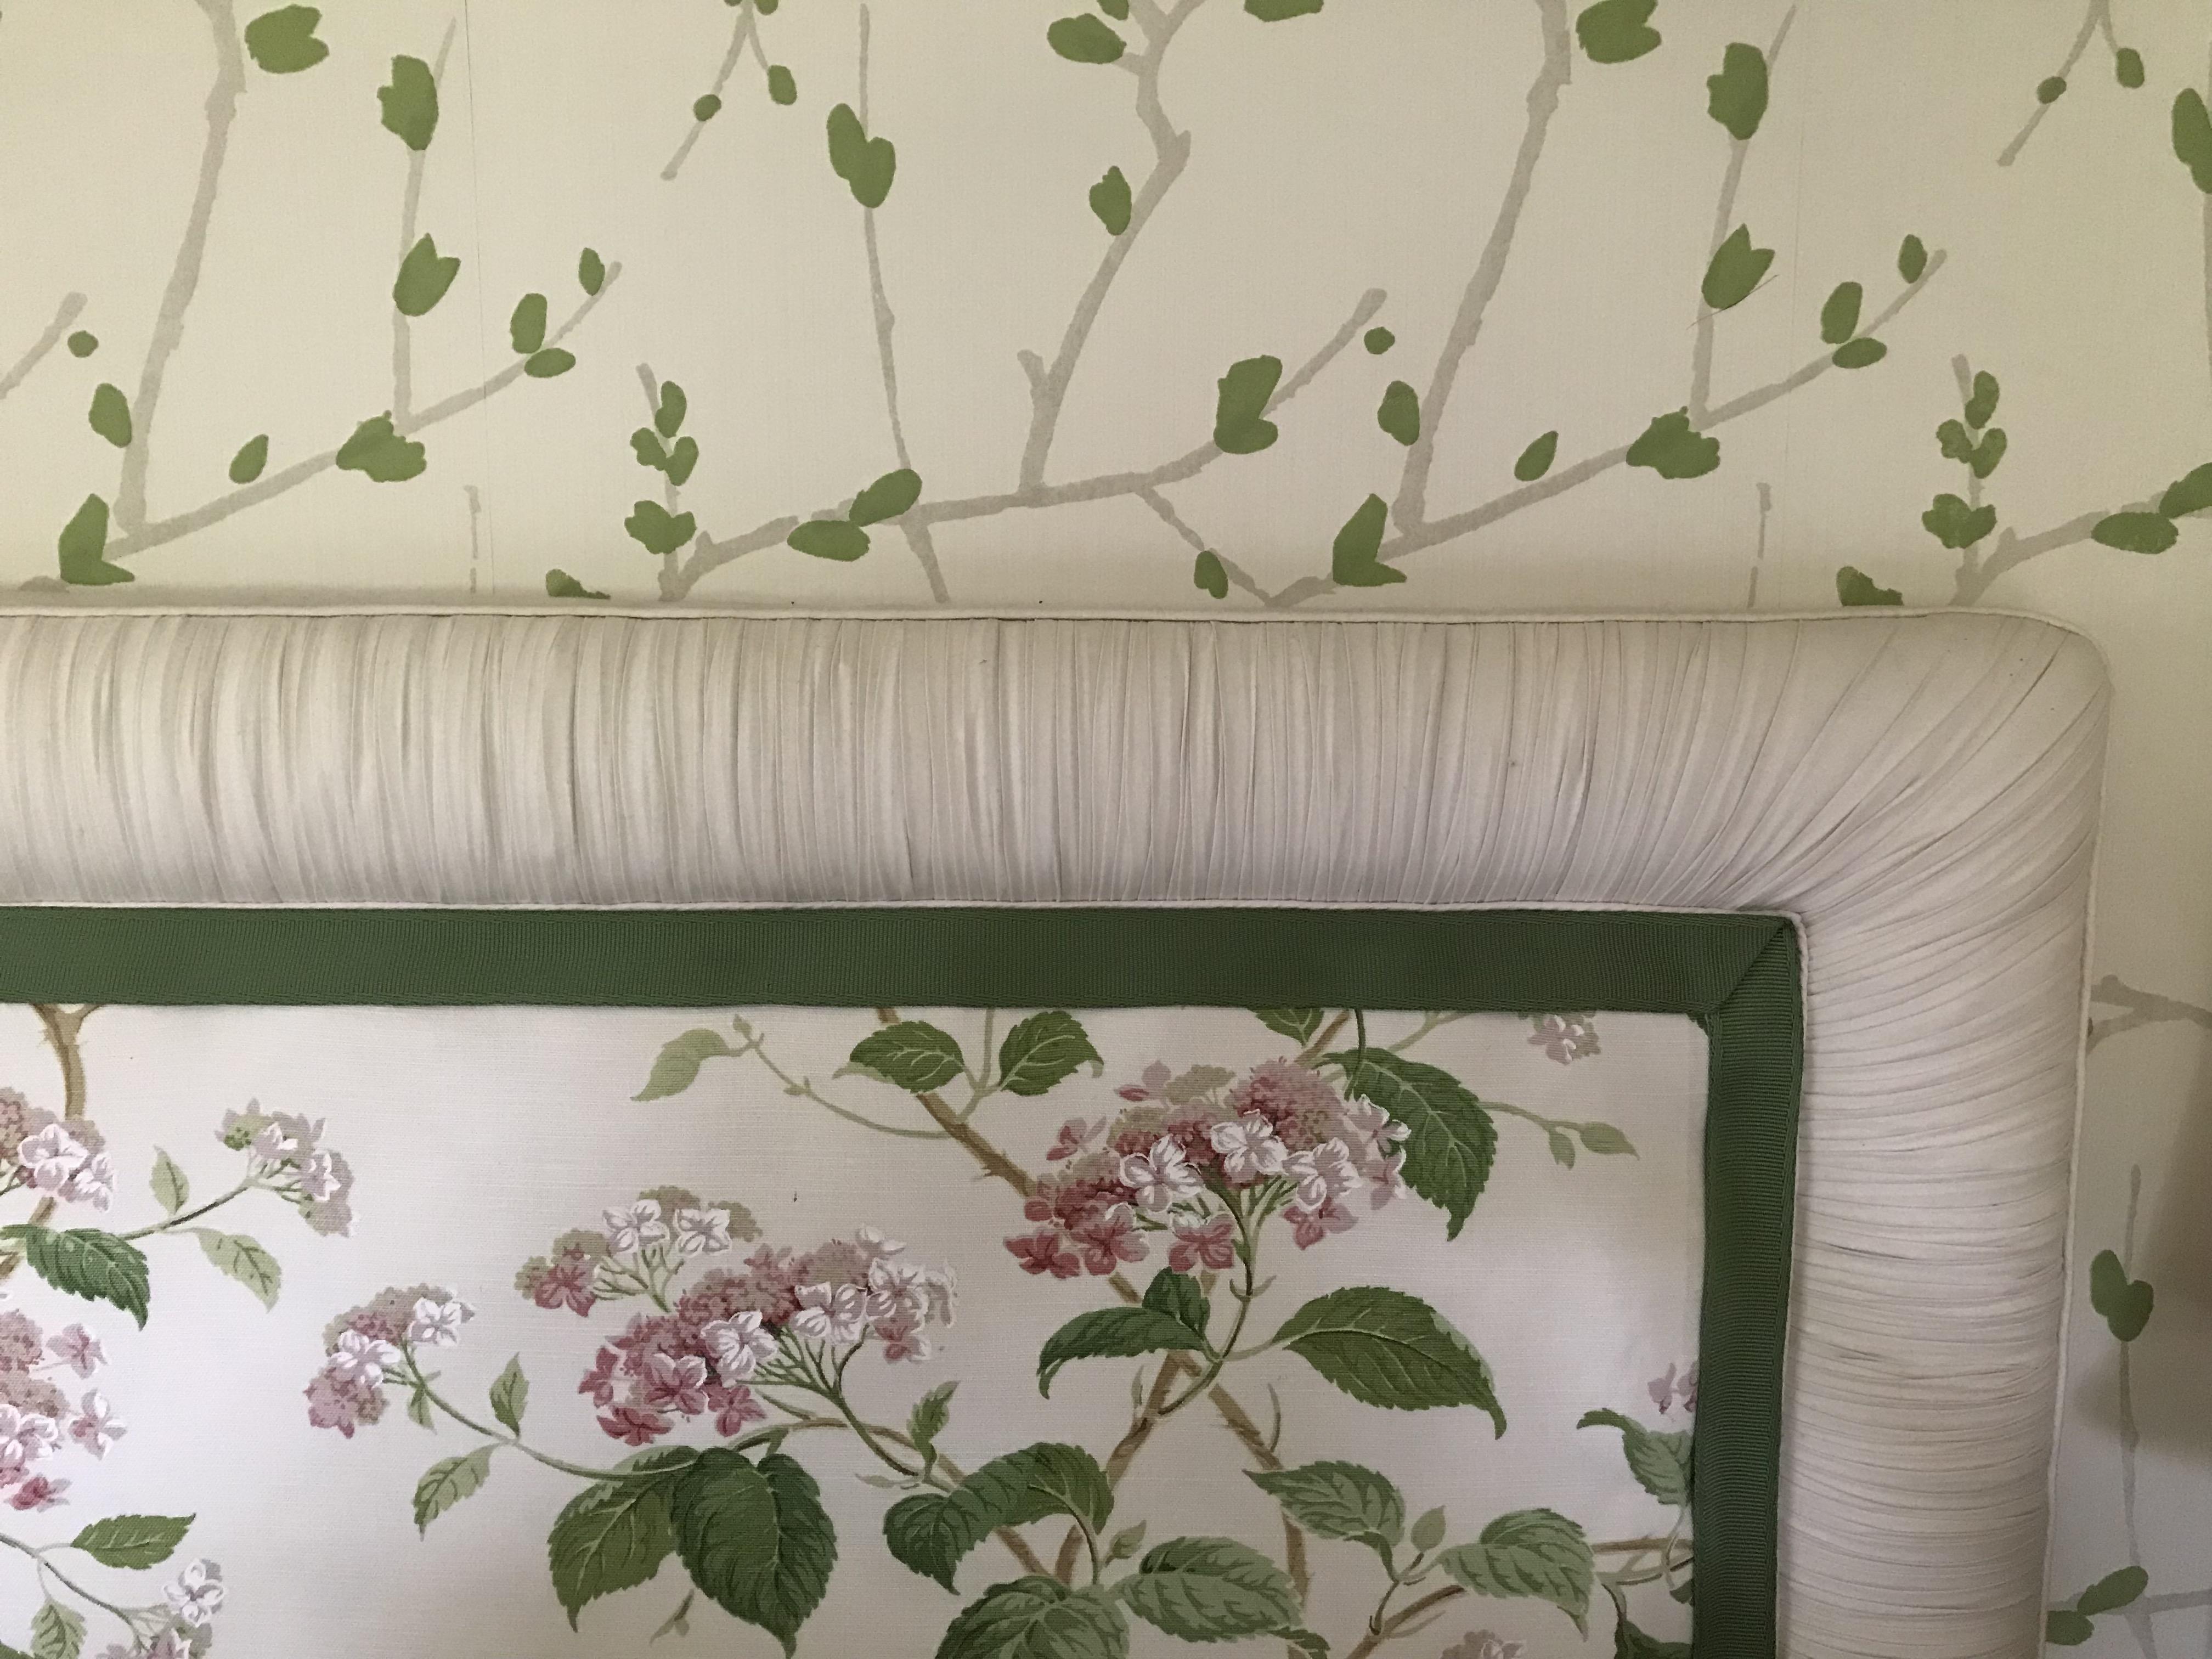 Master Bedroom Headboard Re-upholster